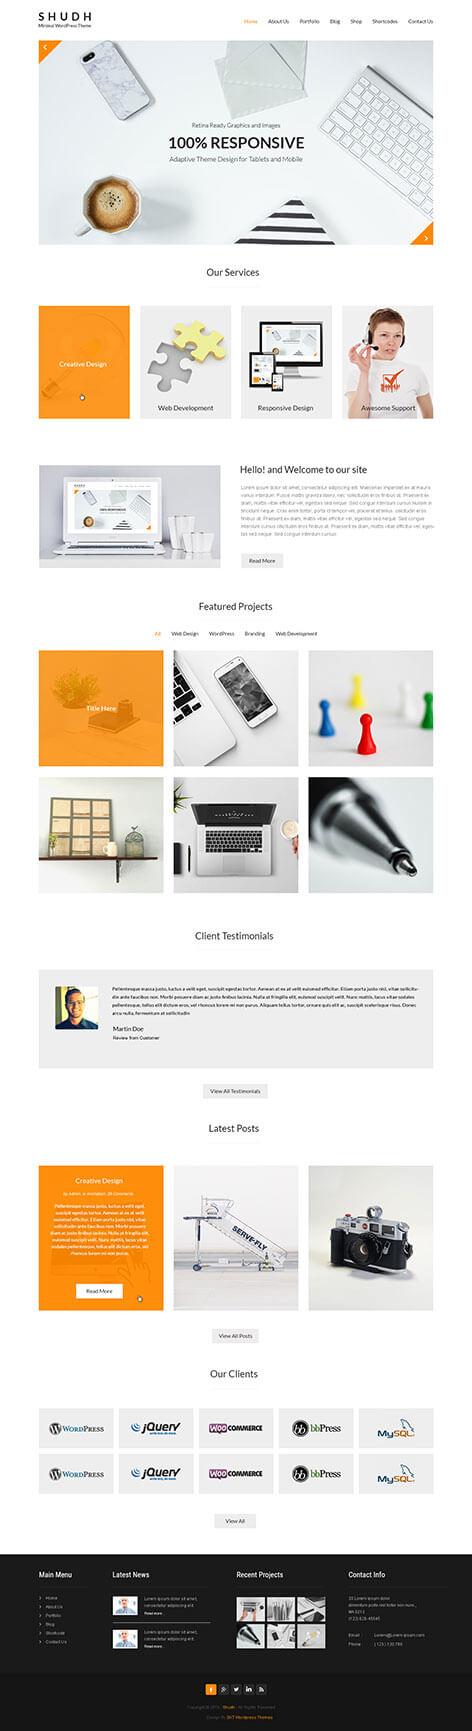 shudh minimal wordpress theme1 - Shudh